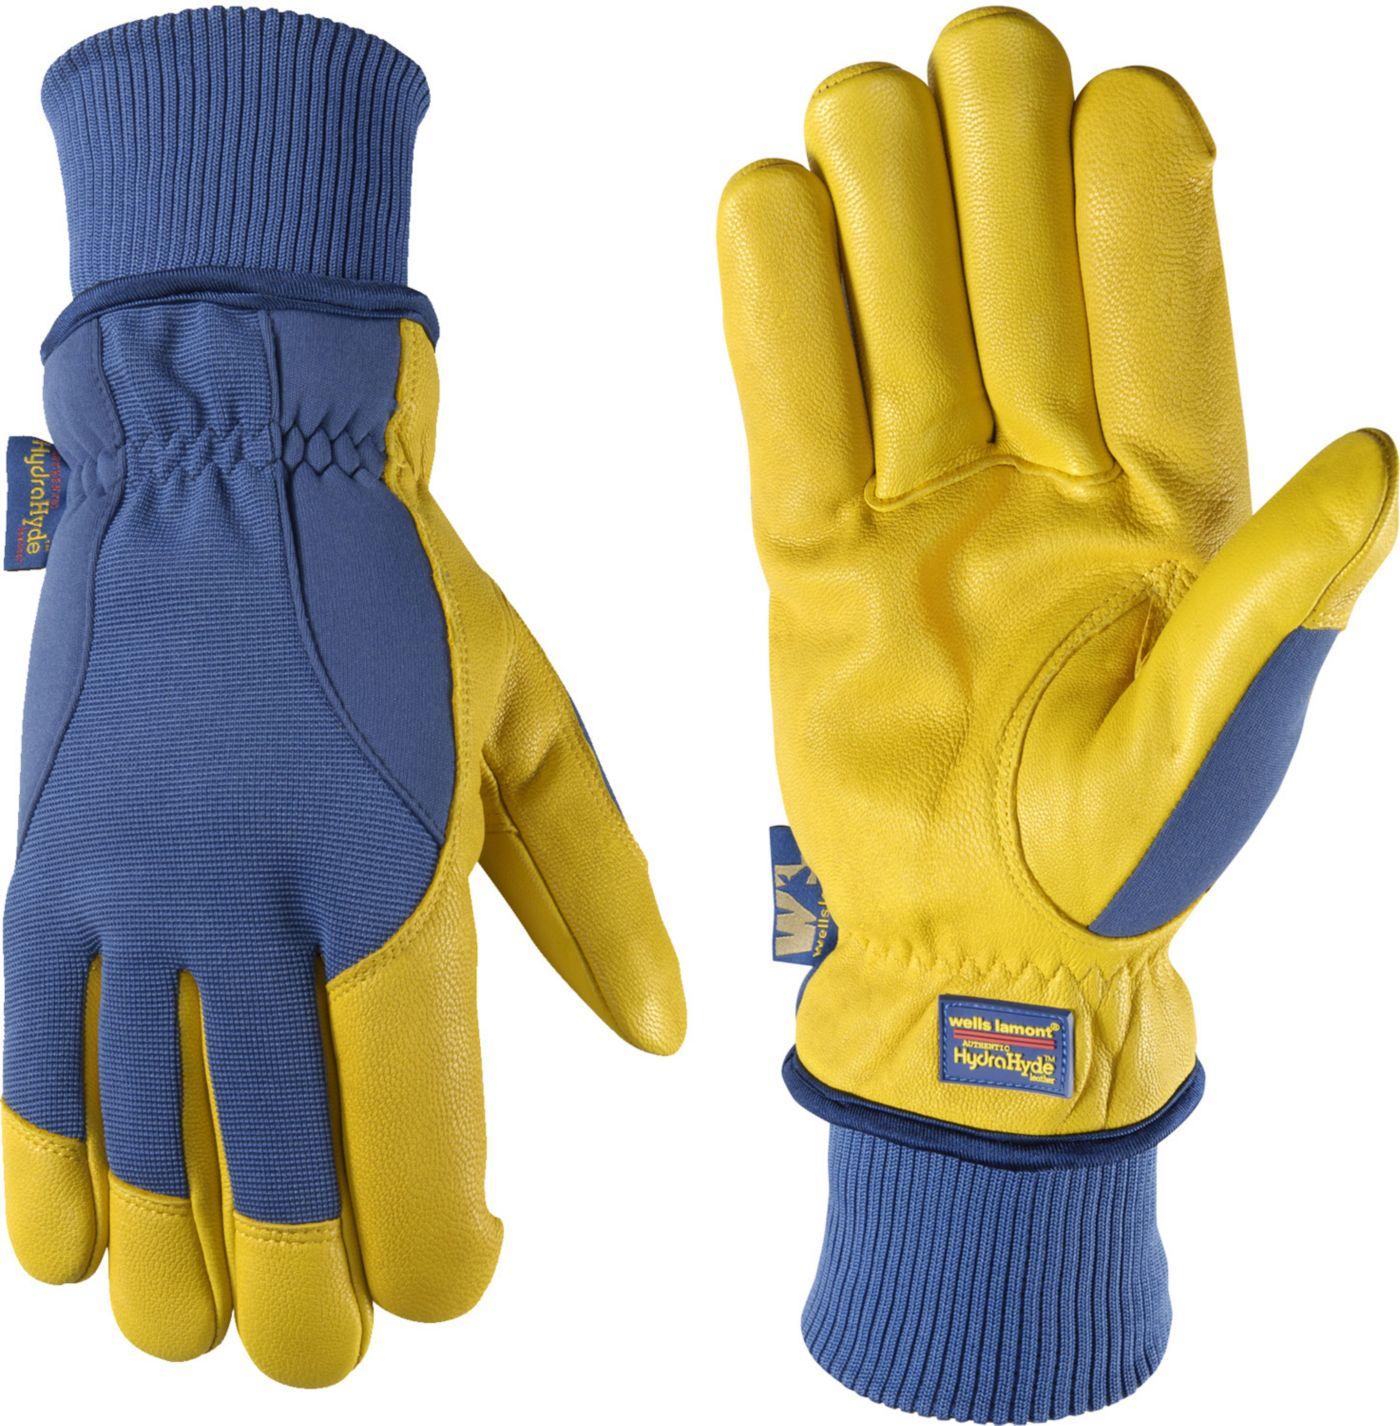 Wells Lamont Men's HydraHyde Goatskin Gloves